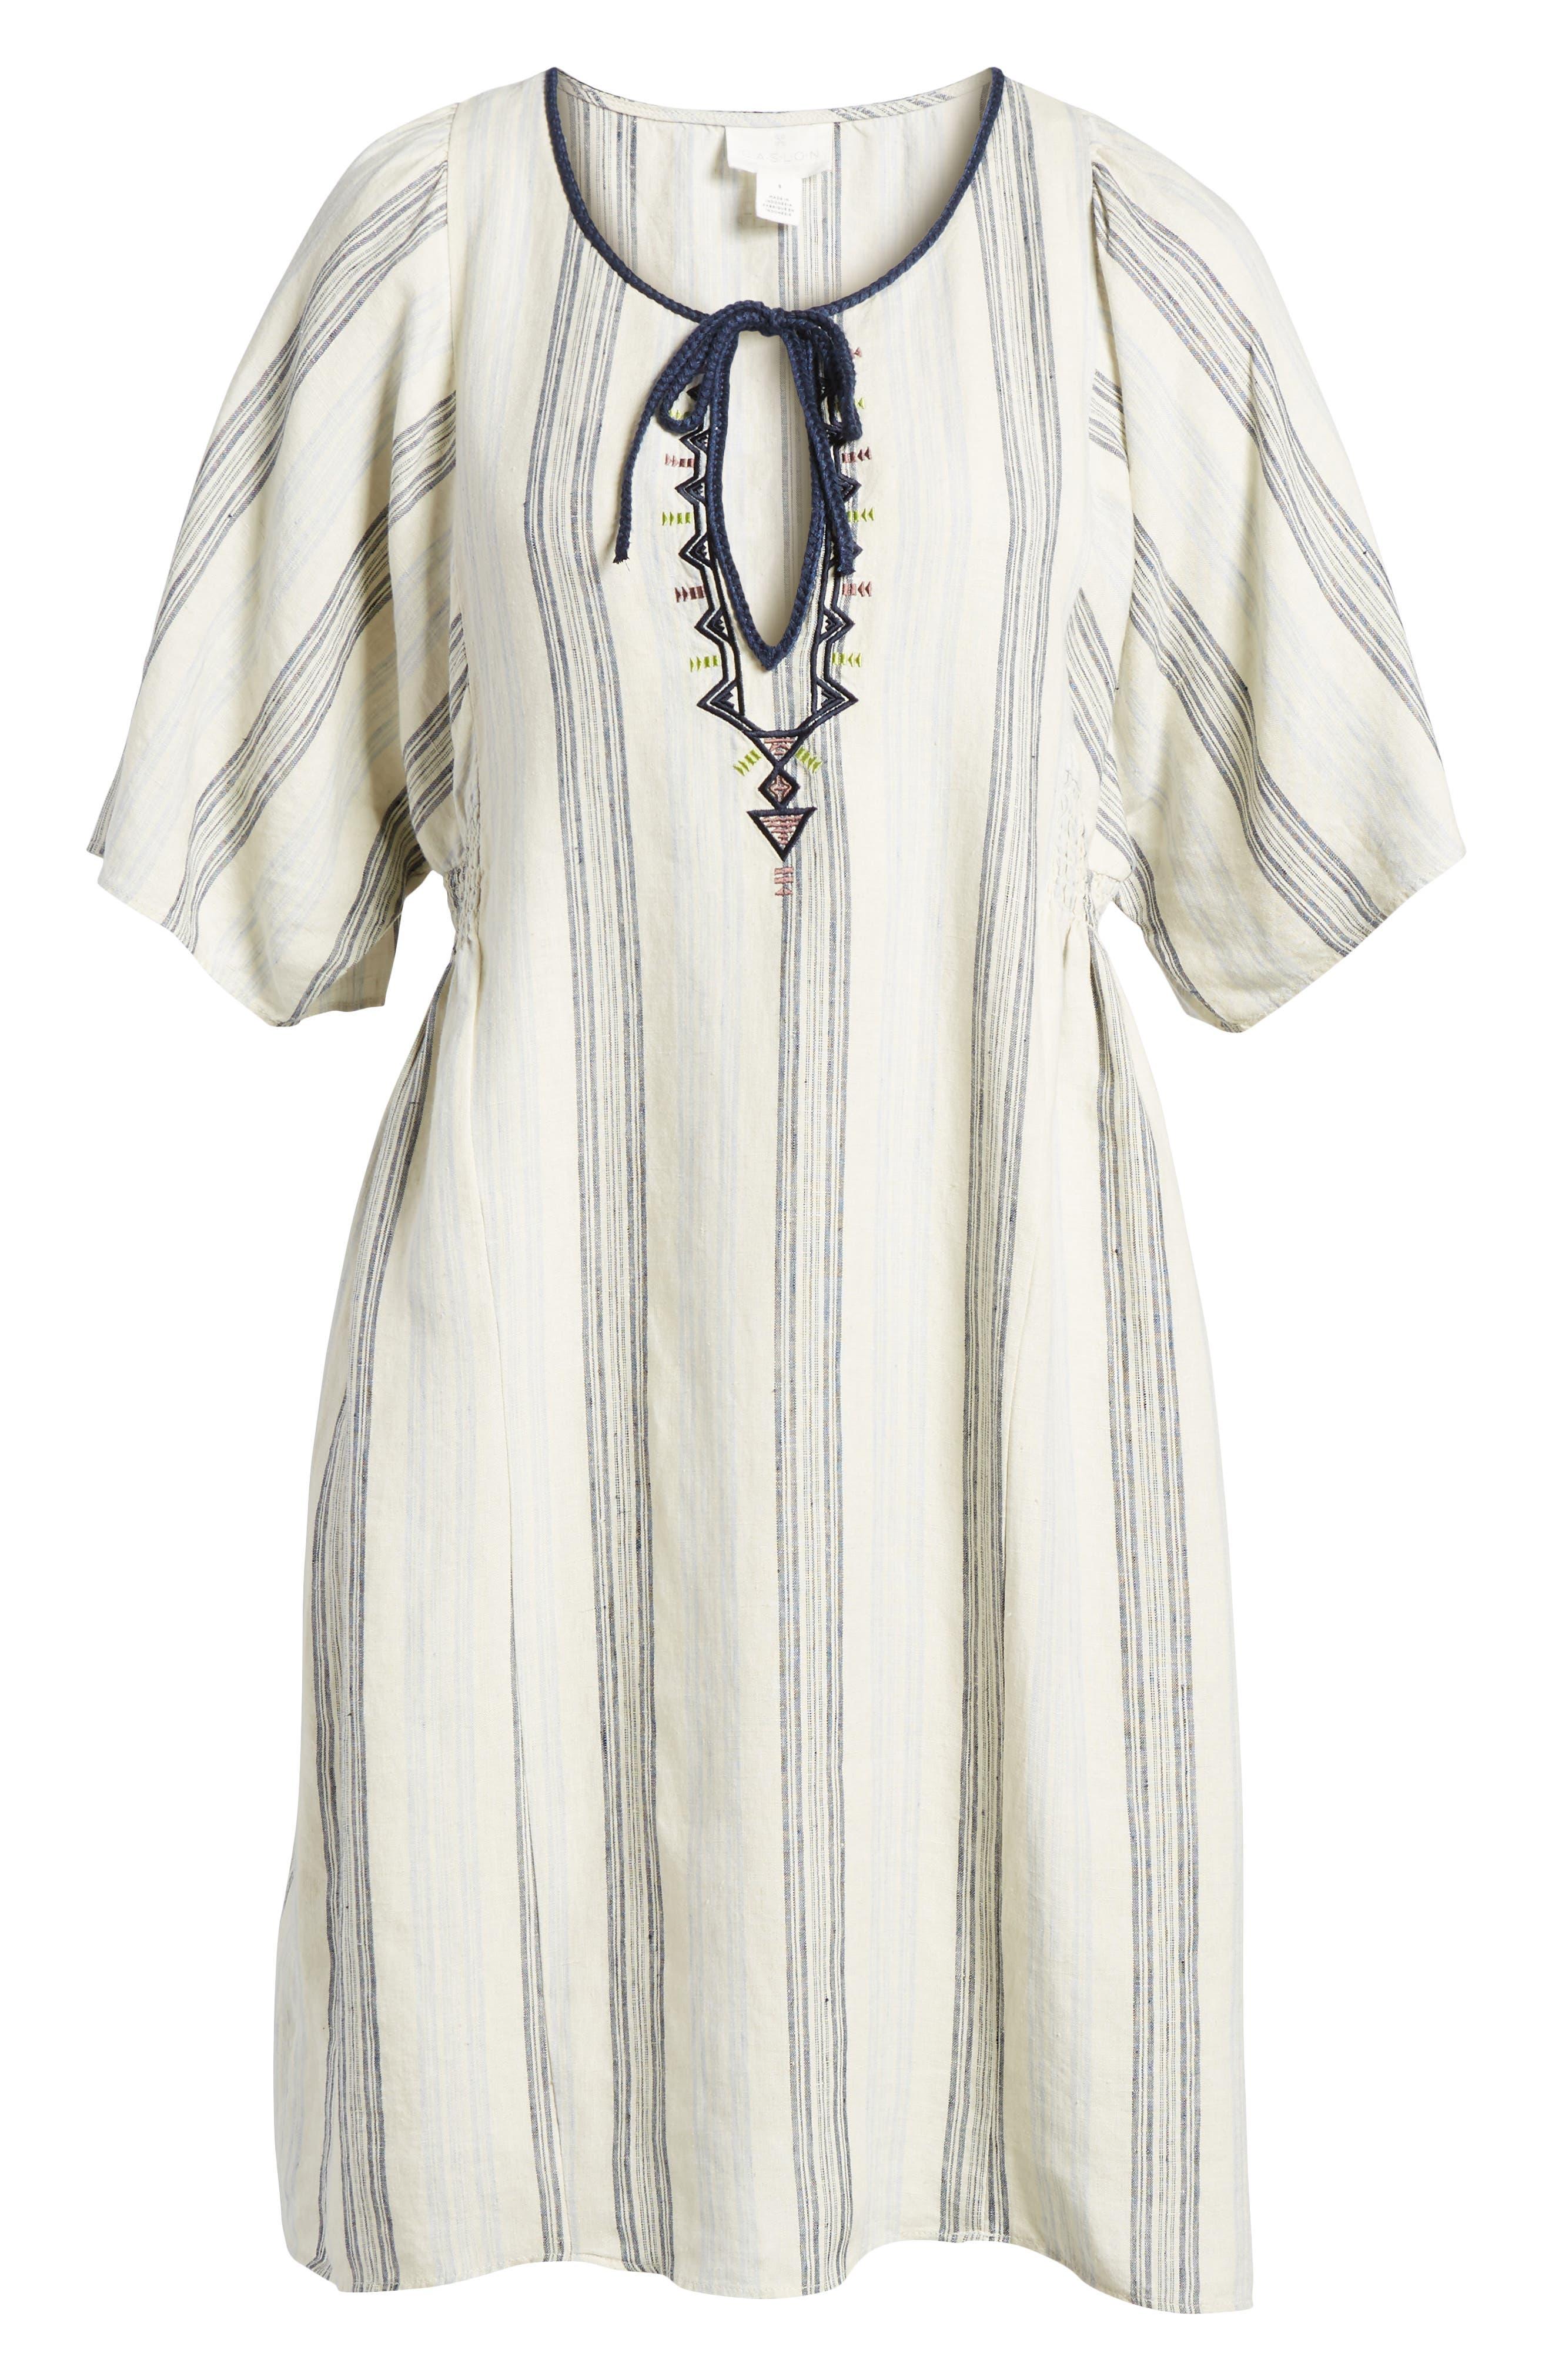 Stripe Linen Keyhole Shift Dress,                             Alternate thumbnail 7, color,                             Beige Rainy Day Frankie Stripe